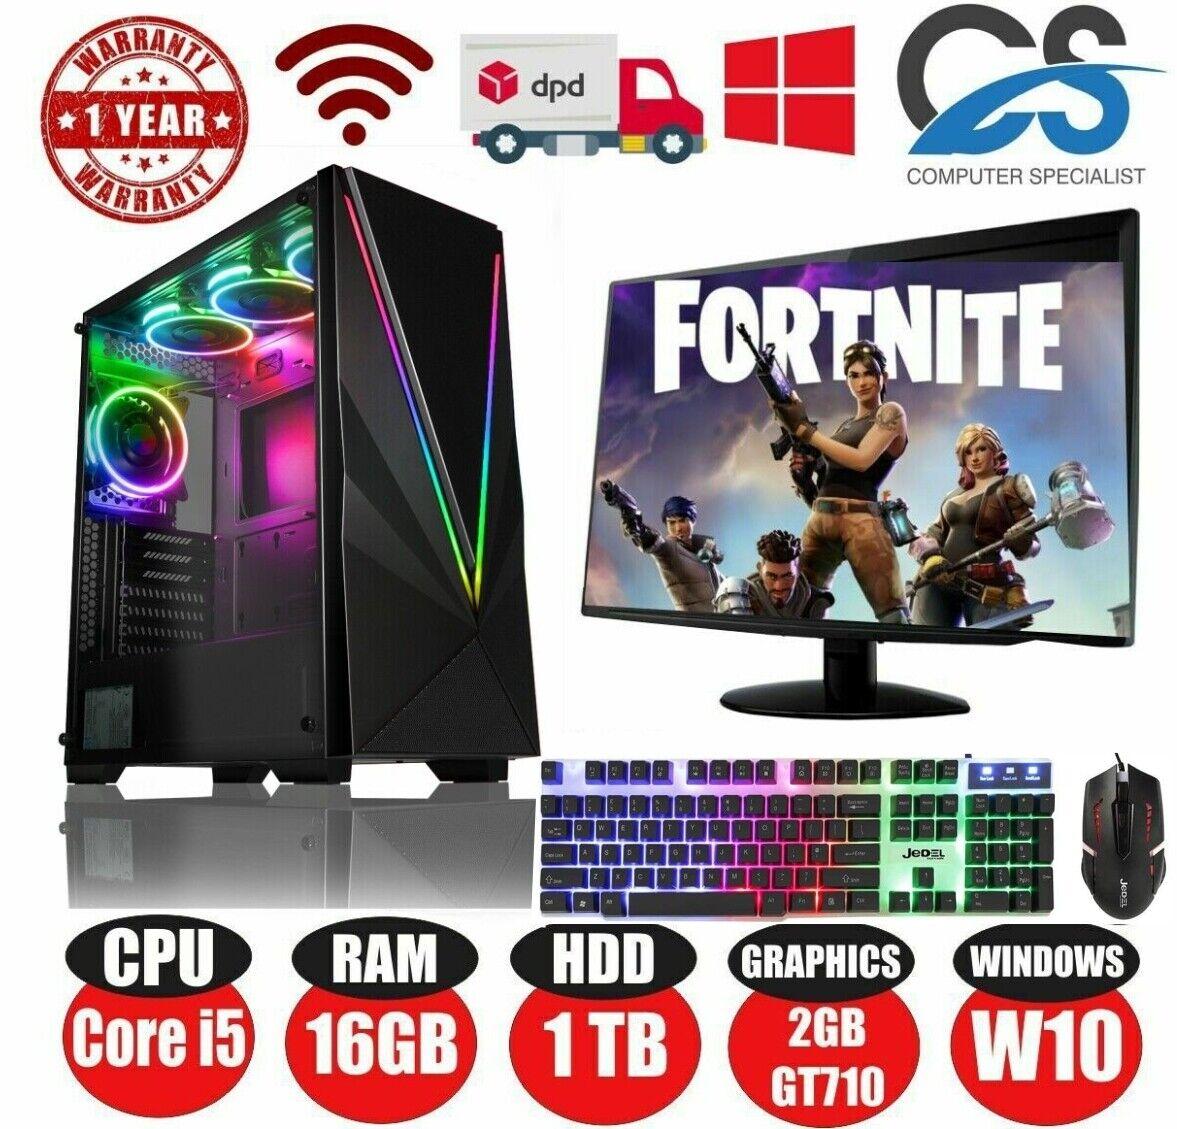 Computer Games - RED Gaming PC Computer Bundle Intel Quad Core i5 16GB 1TB Windows 10 2GB GT710